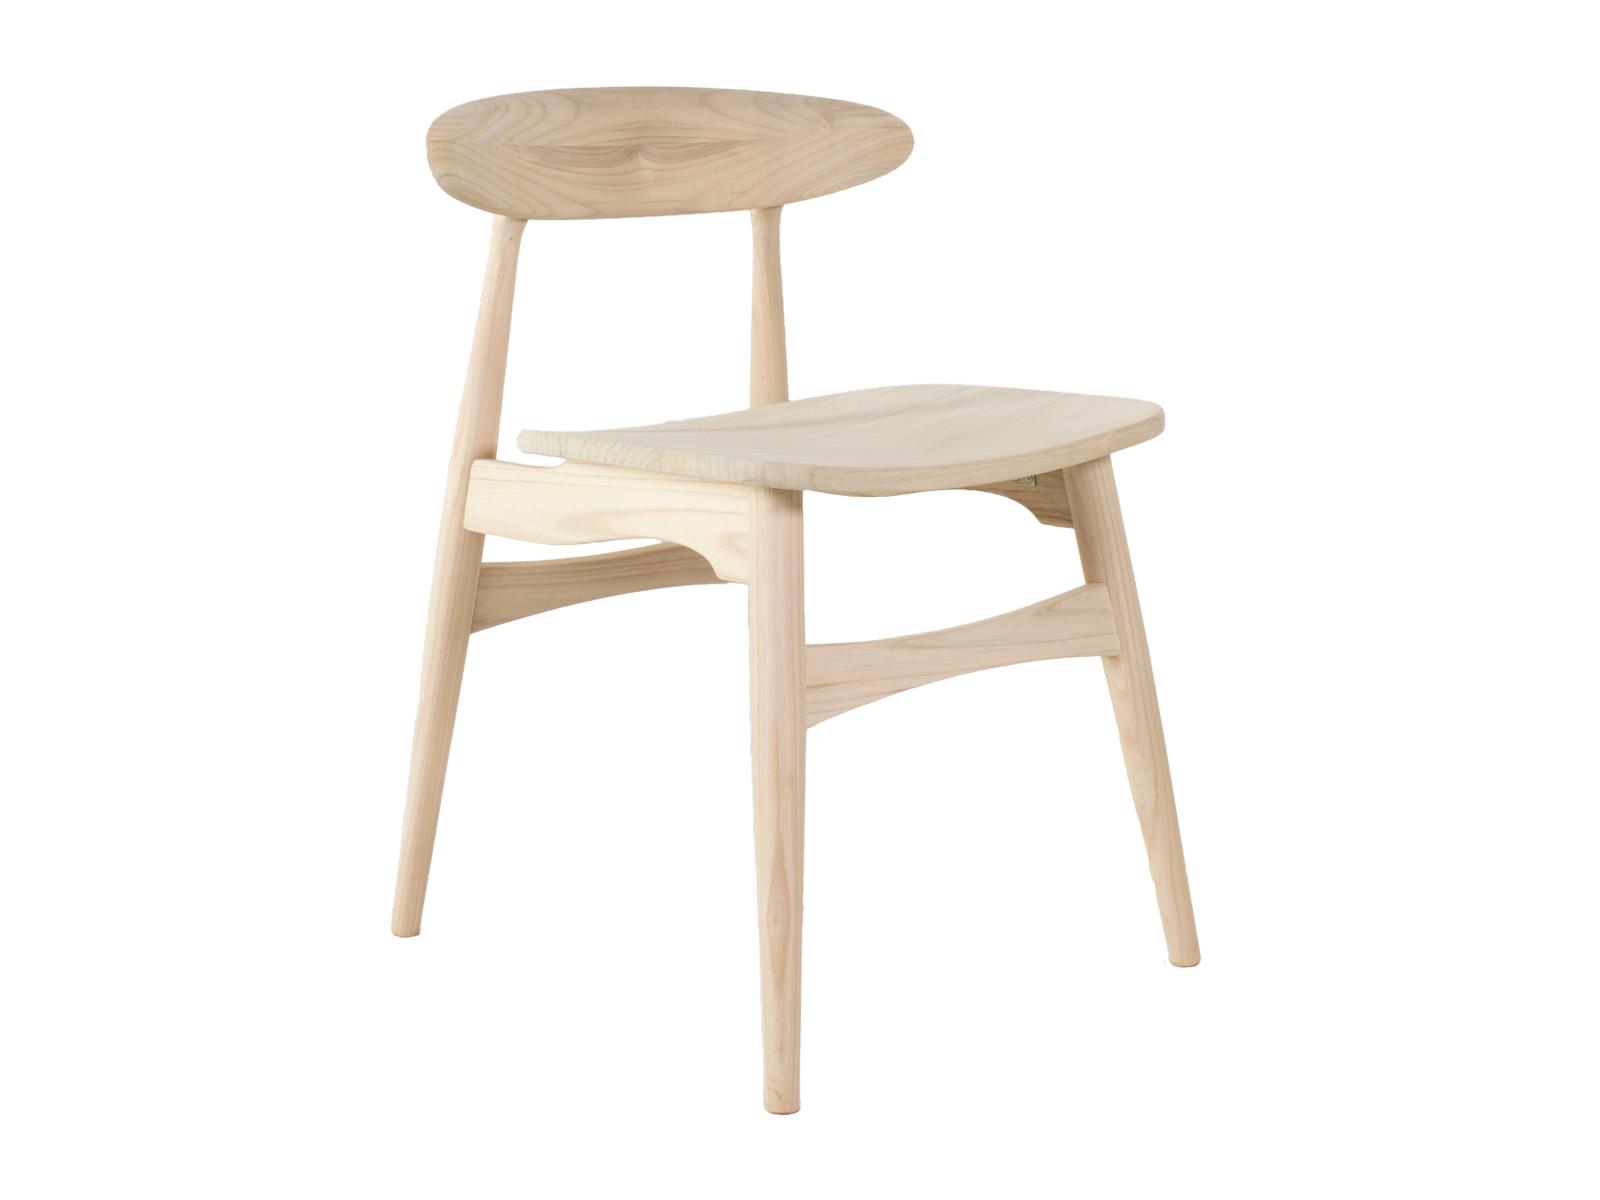 Scandi Chair Curved Back